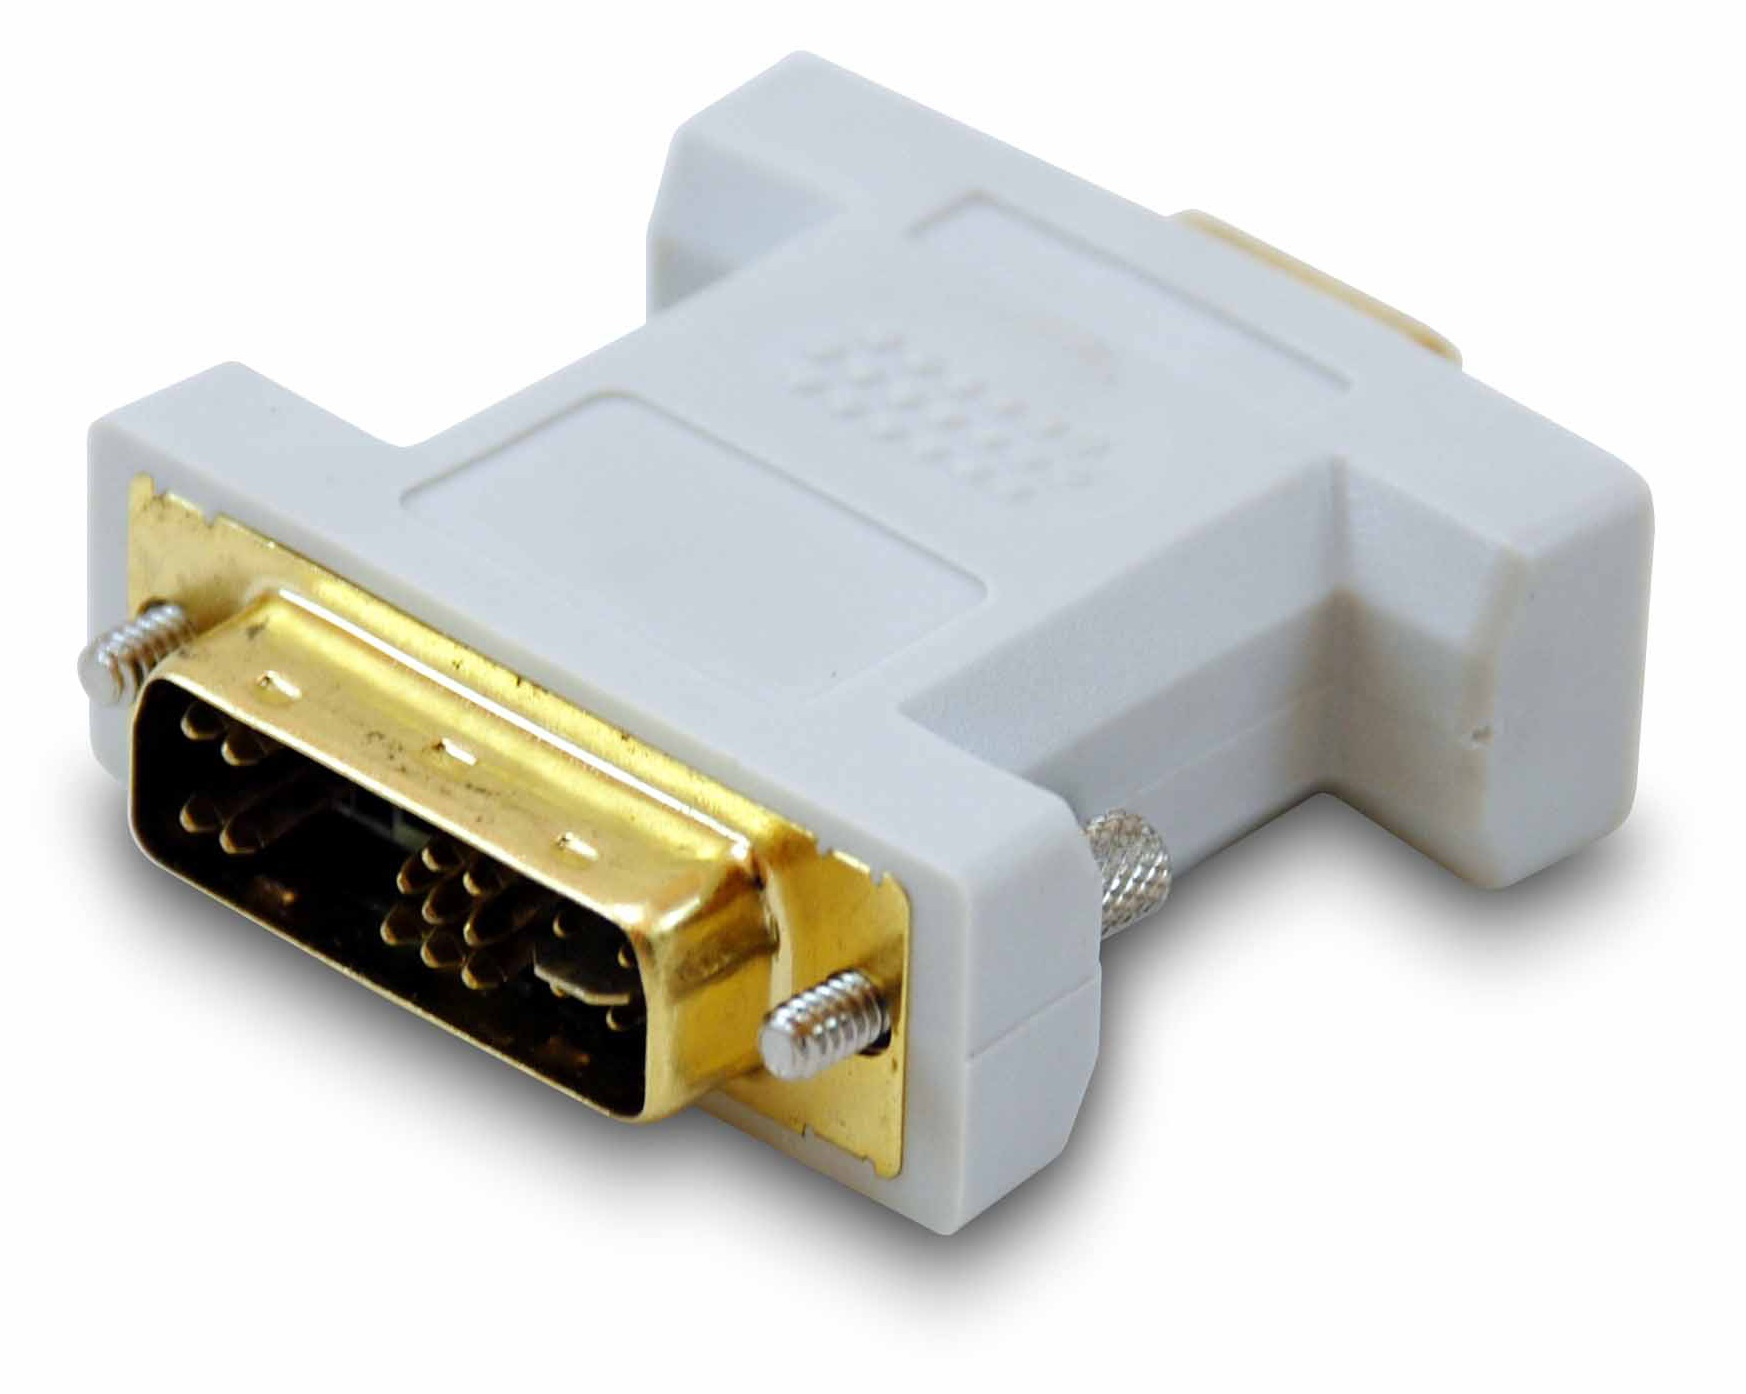 equip 118945 DVI-A VGA Beige Kabelschnittstellen-/adapter